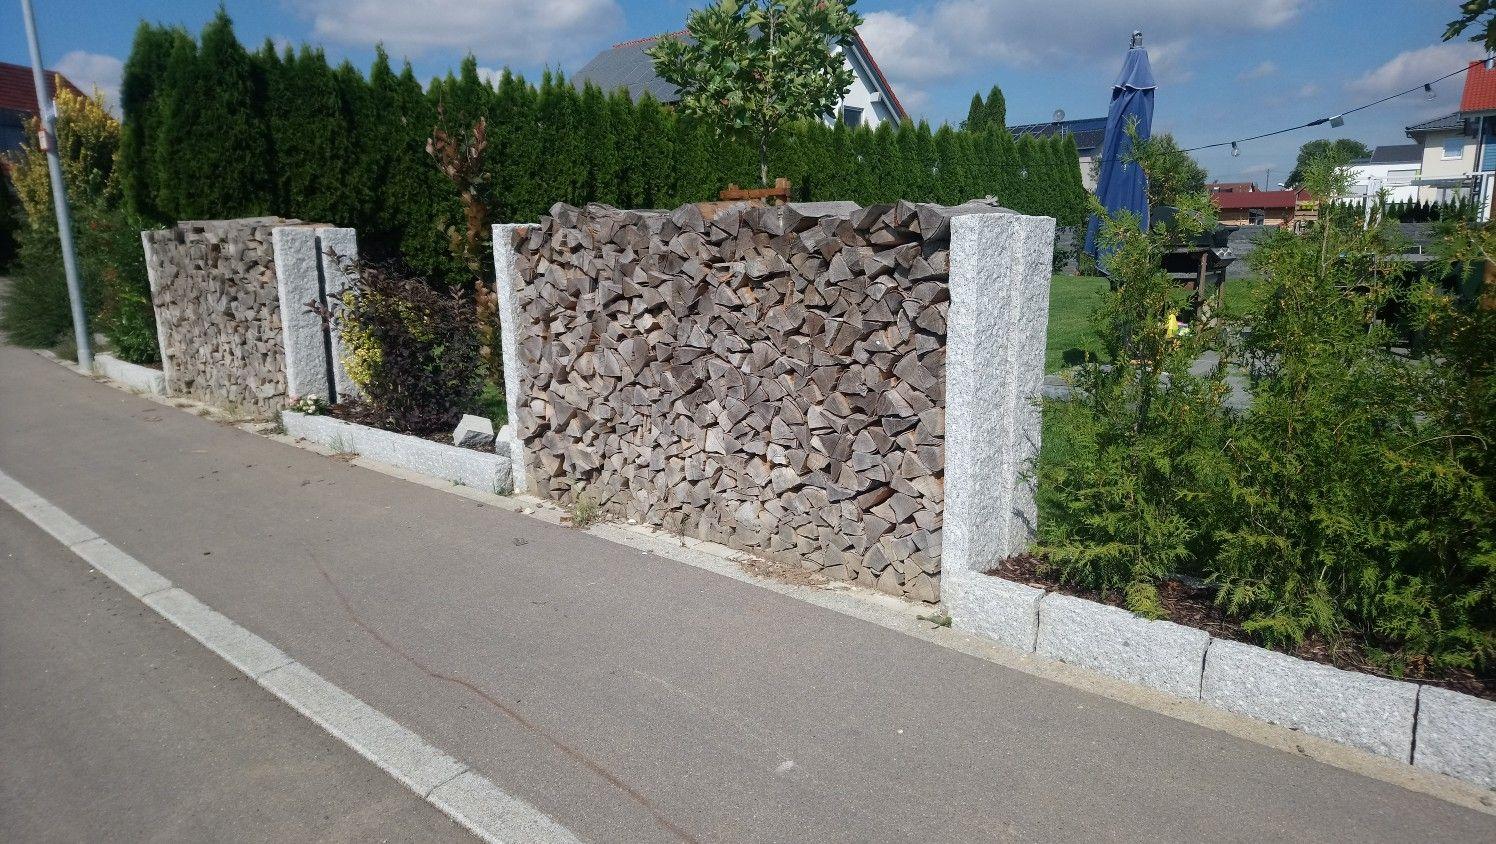 Gartenbegrenzung Garten Zaun Granit Palisade Holz Palisaden